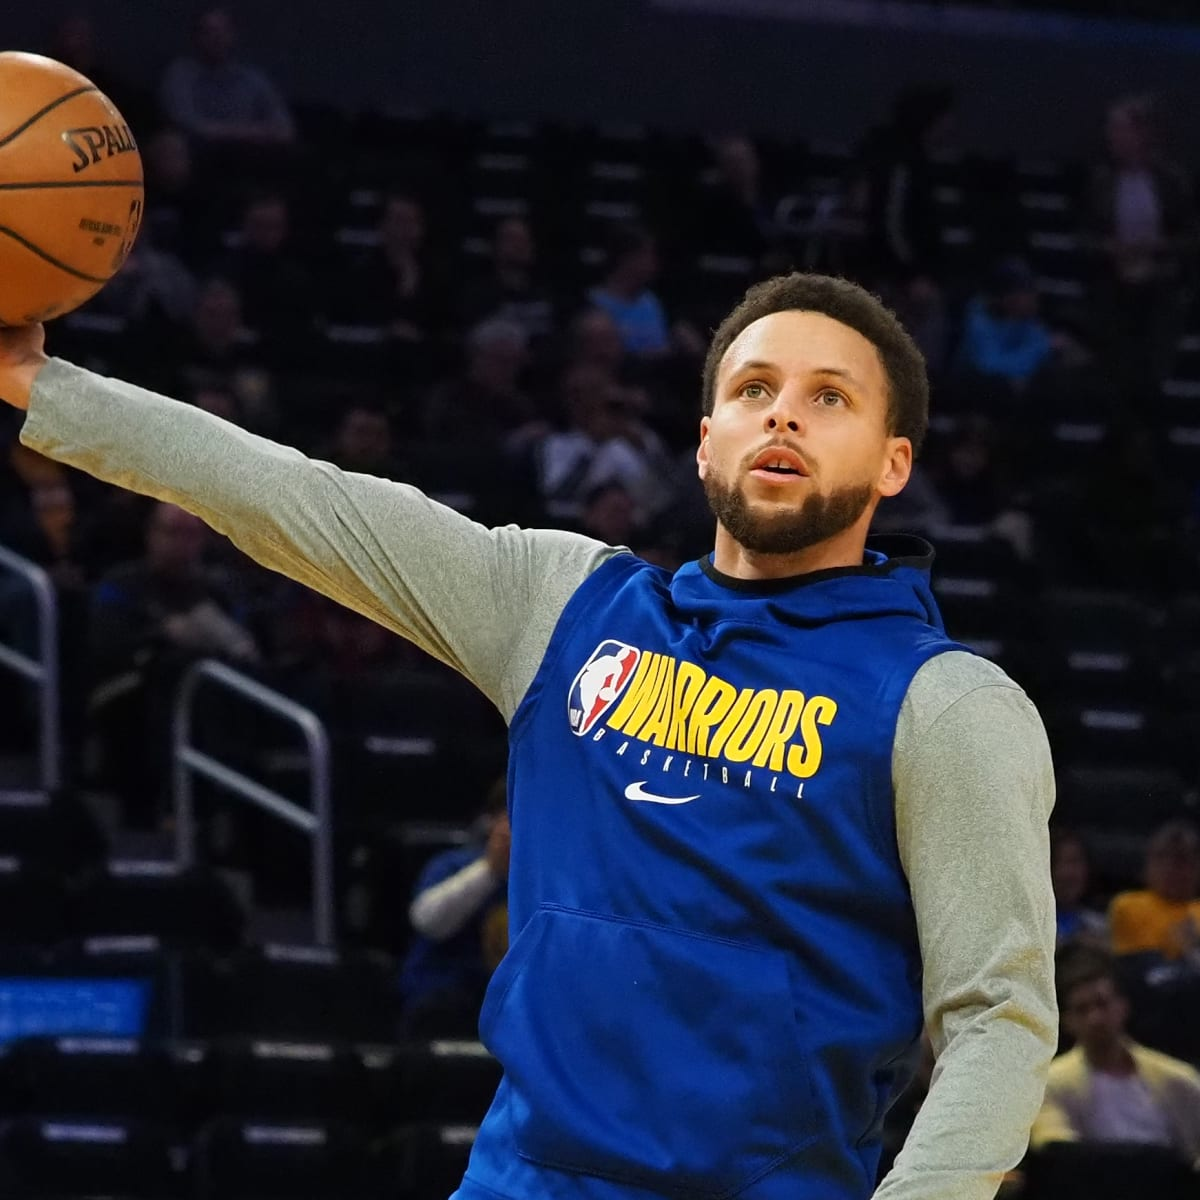 Stephen Curry builds basketball hoop